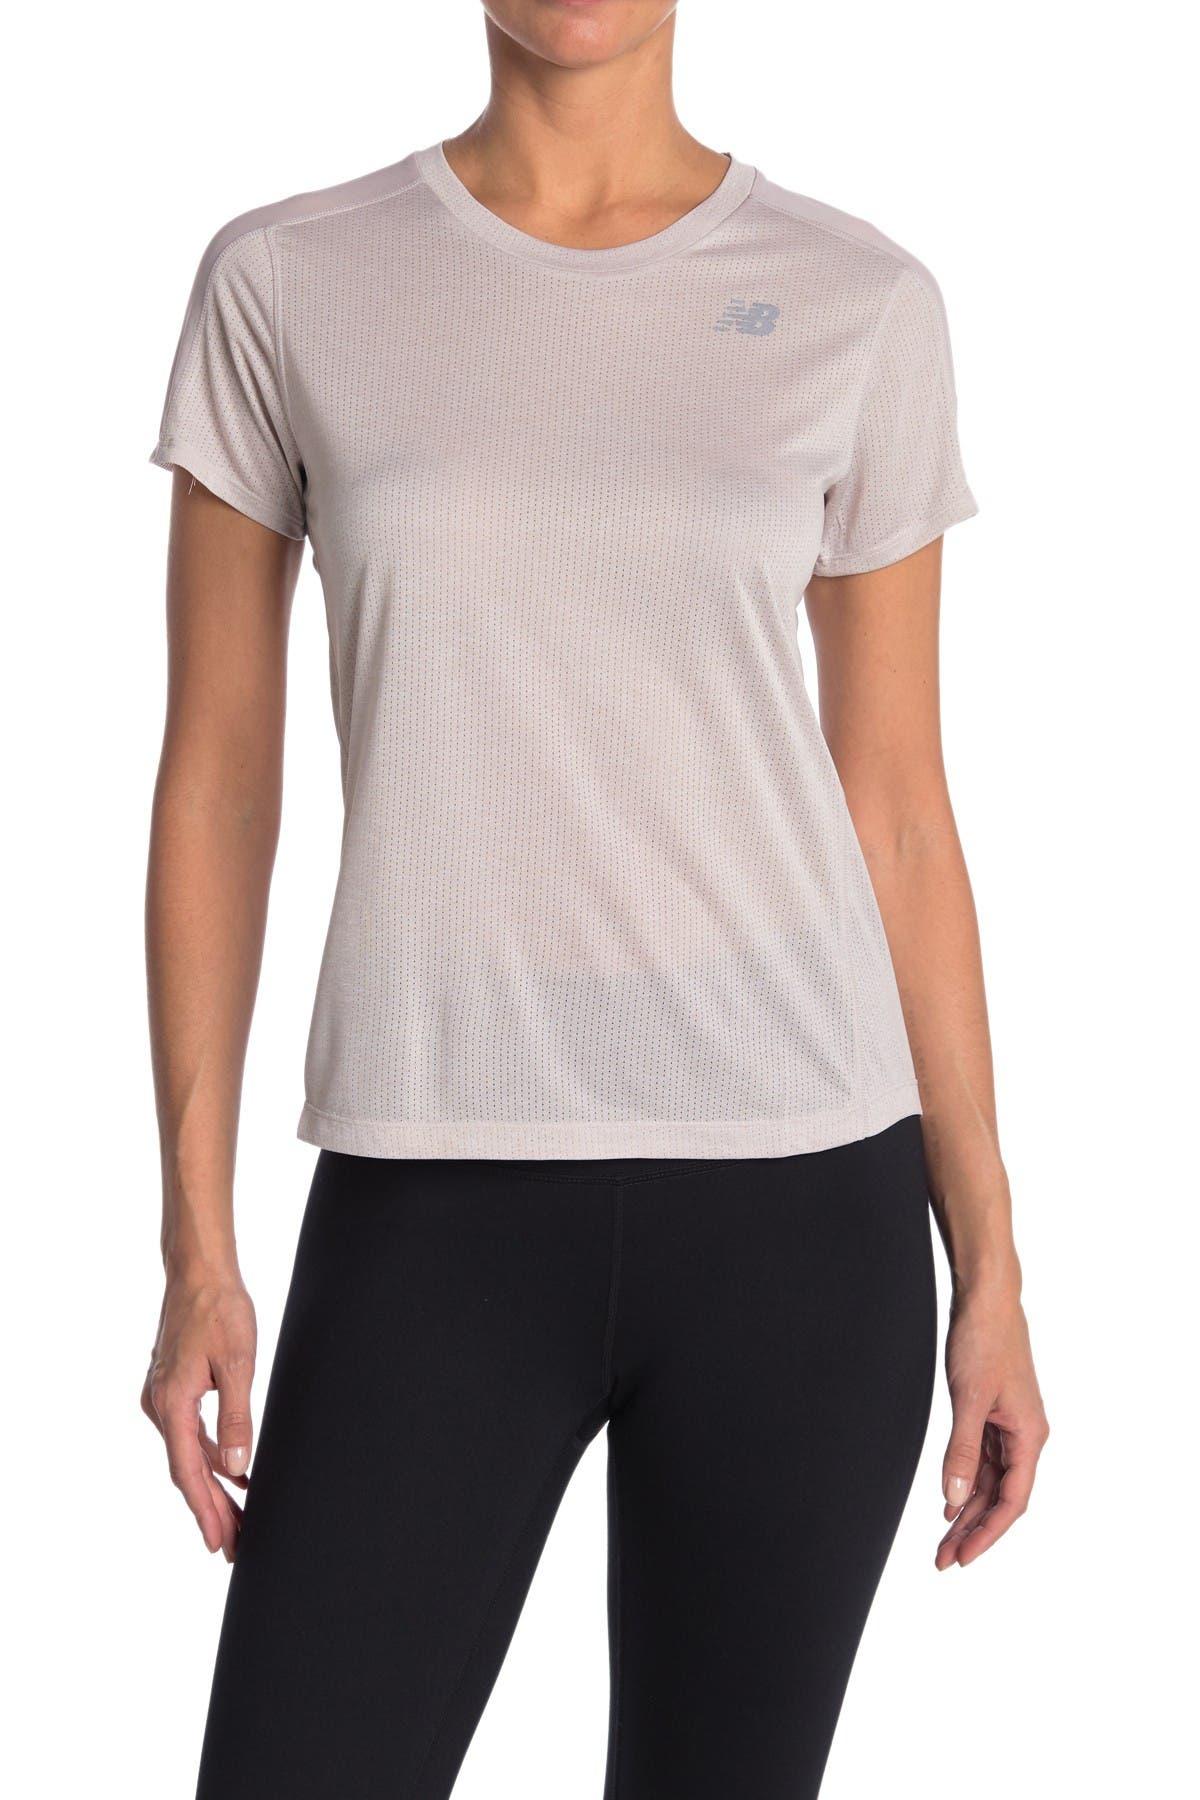 Image of New Balance Impact Short Sleeve Running T-Shirt